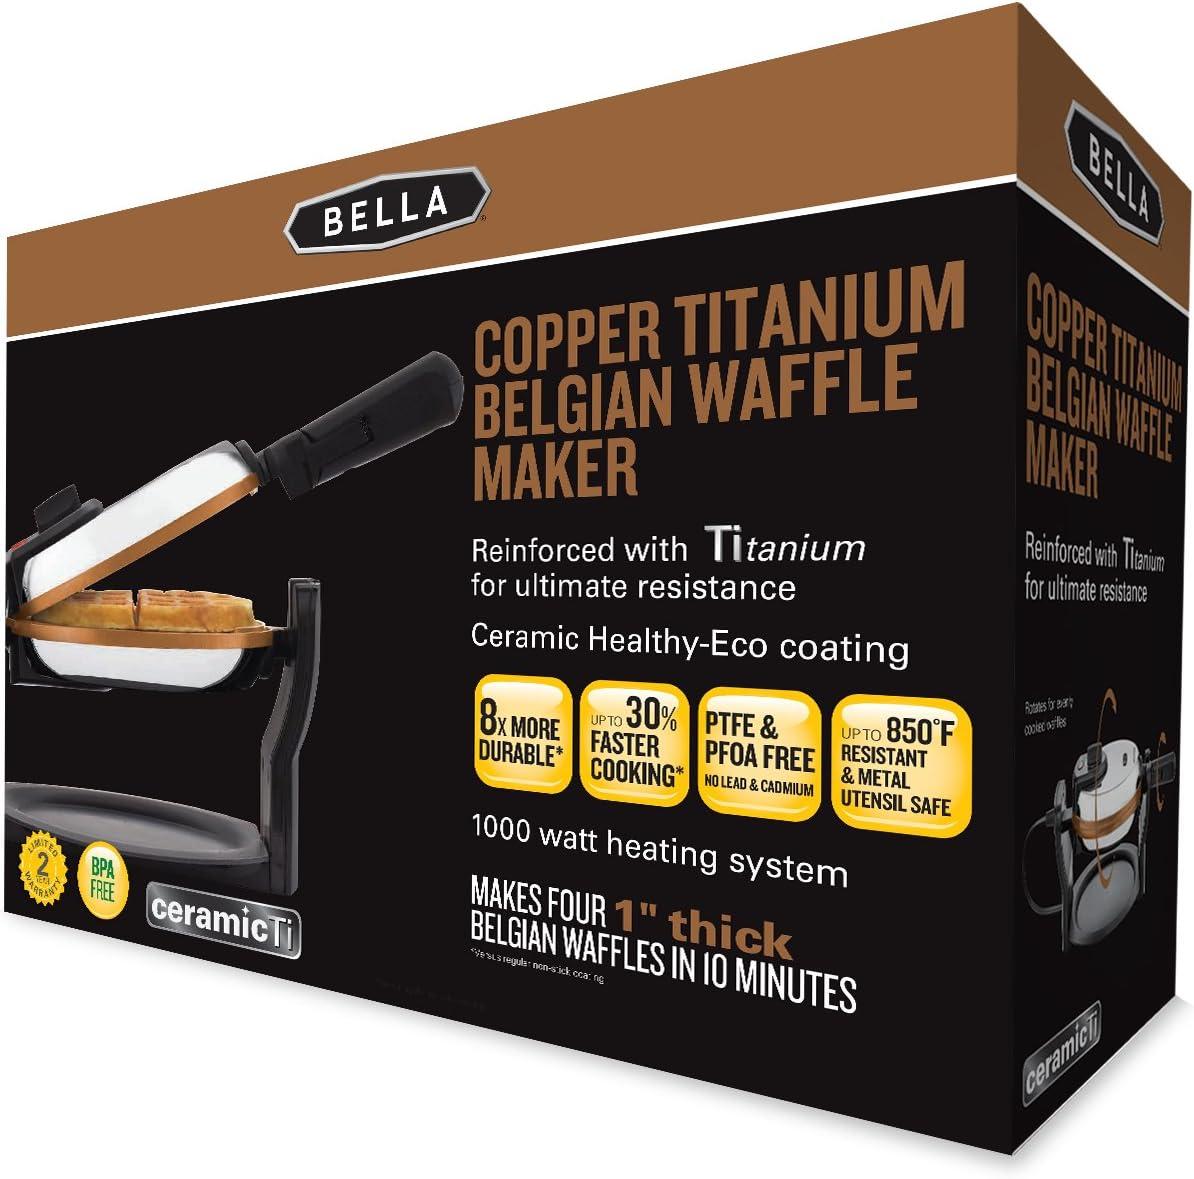 Stainless 1000 Watt 14608 BELLA Copper Titanium Coated Rotating Belgian Waffle Maker